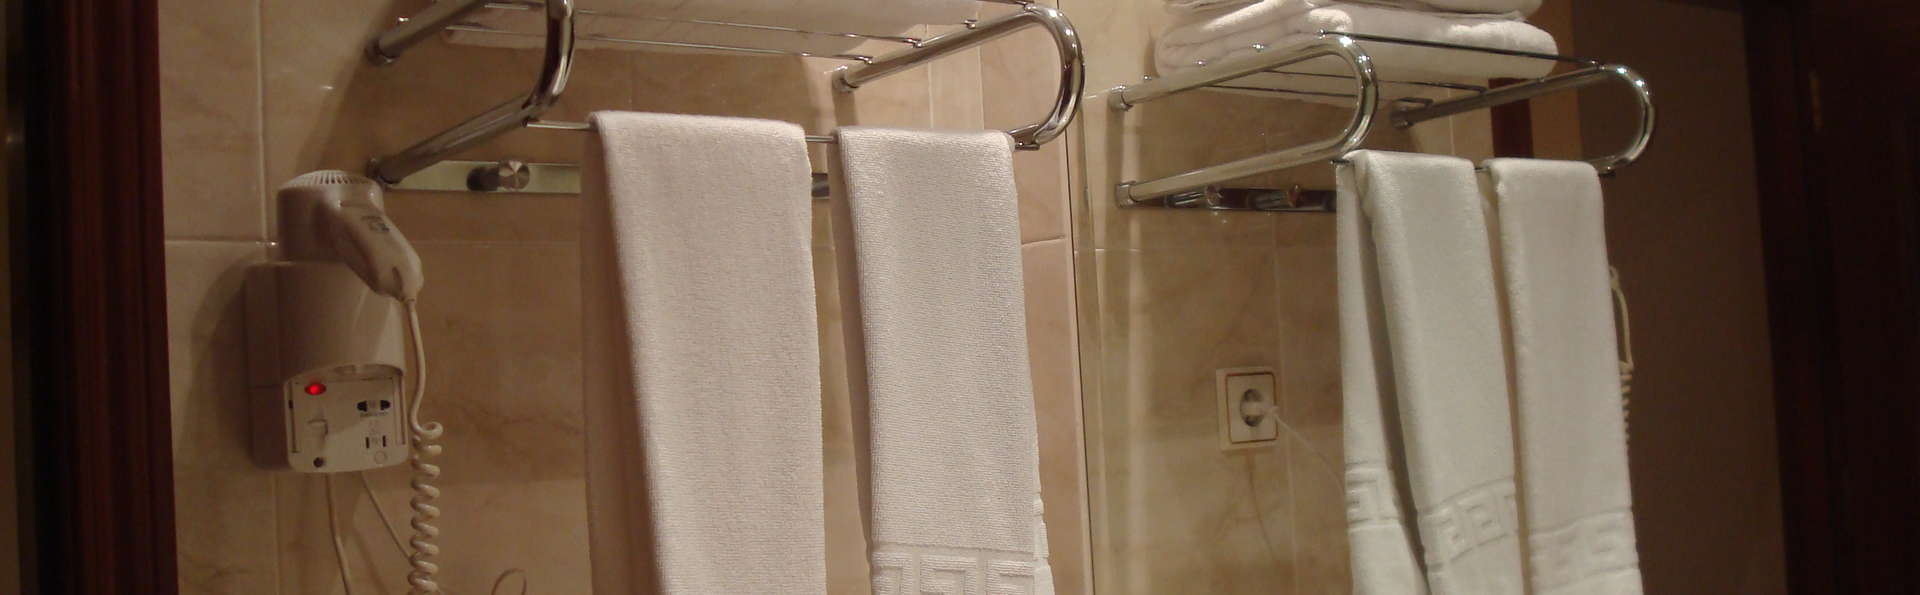 Hotel Roma Aurea - bano.JPG